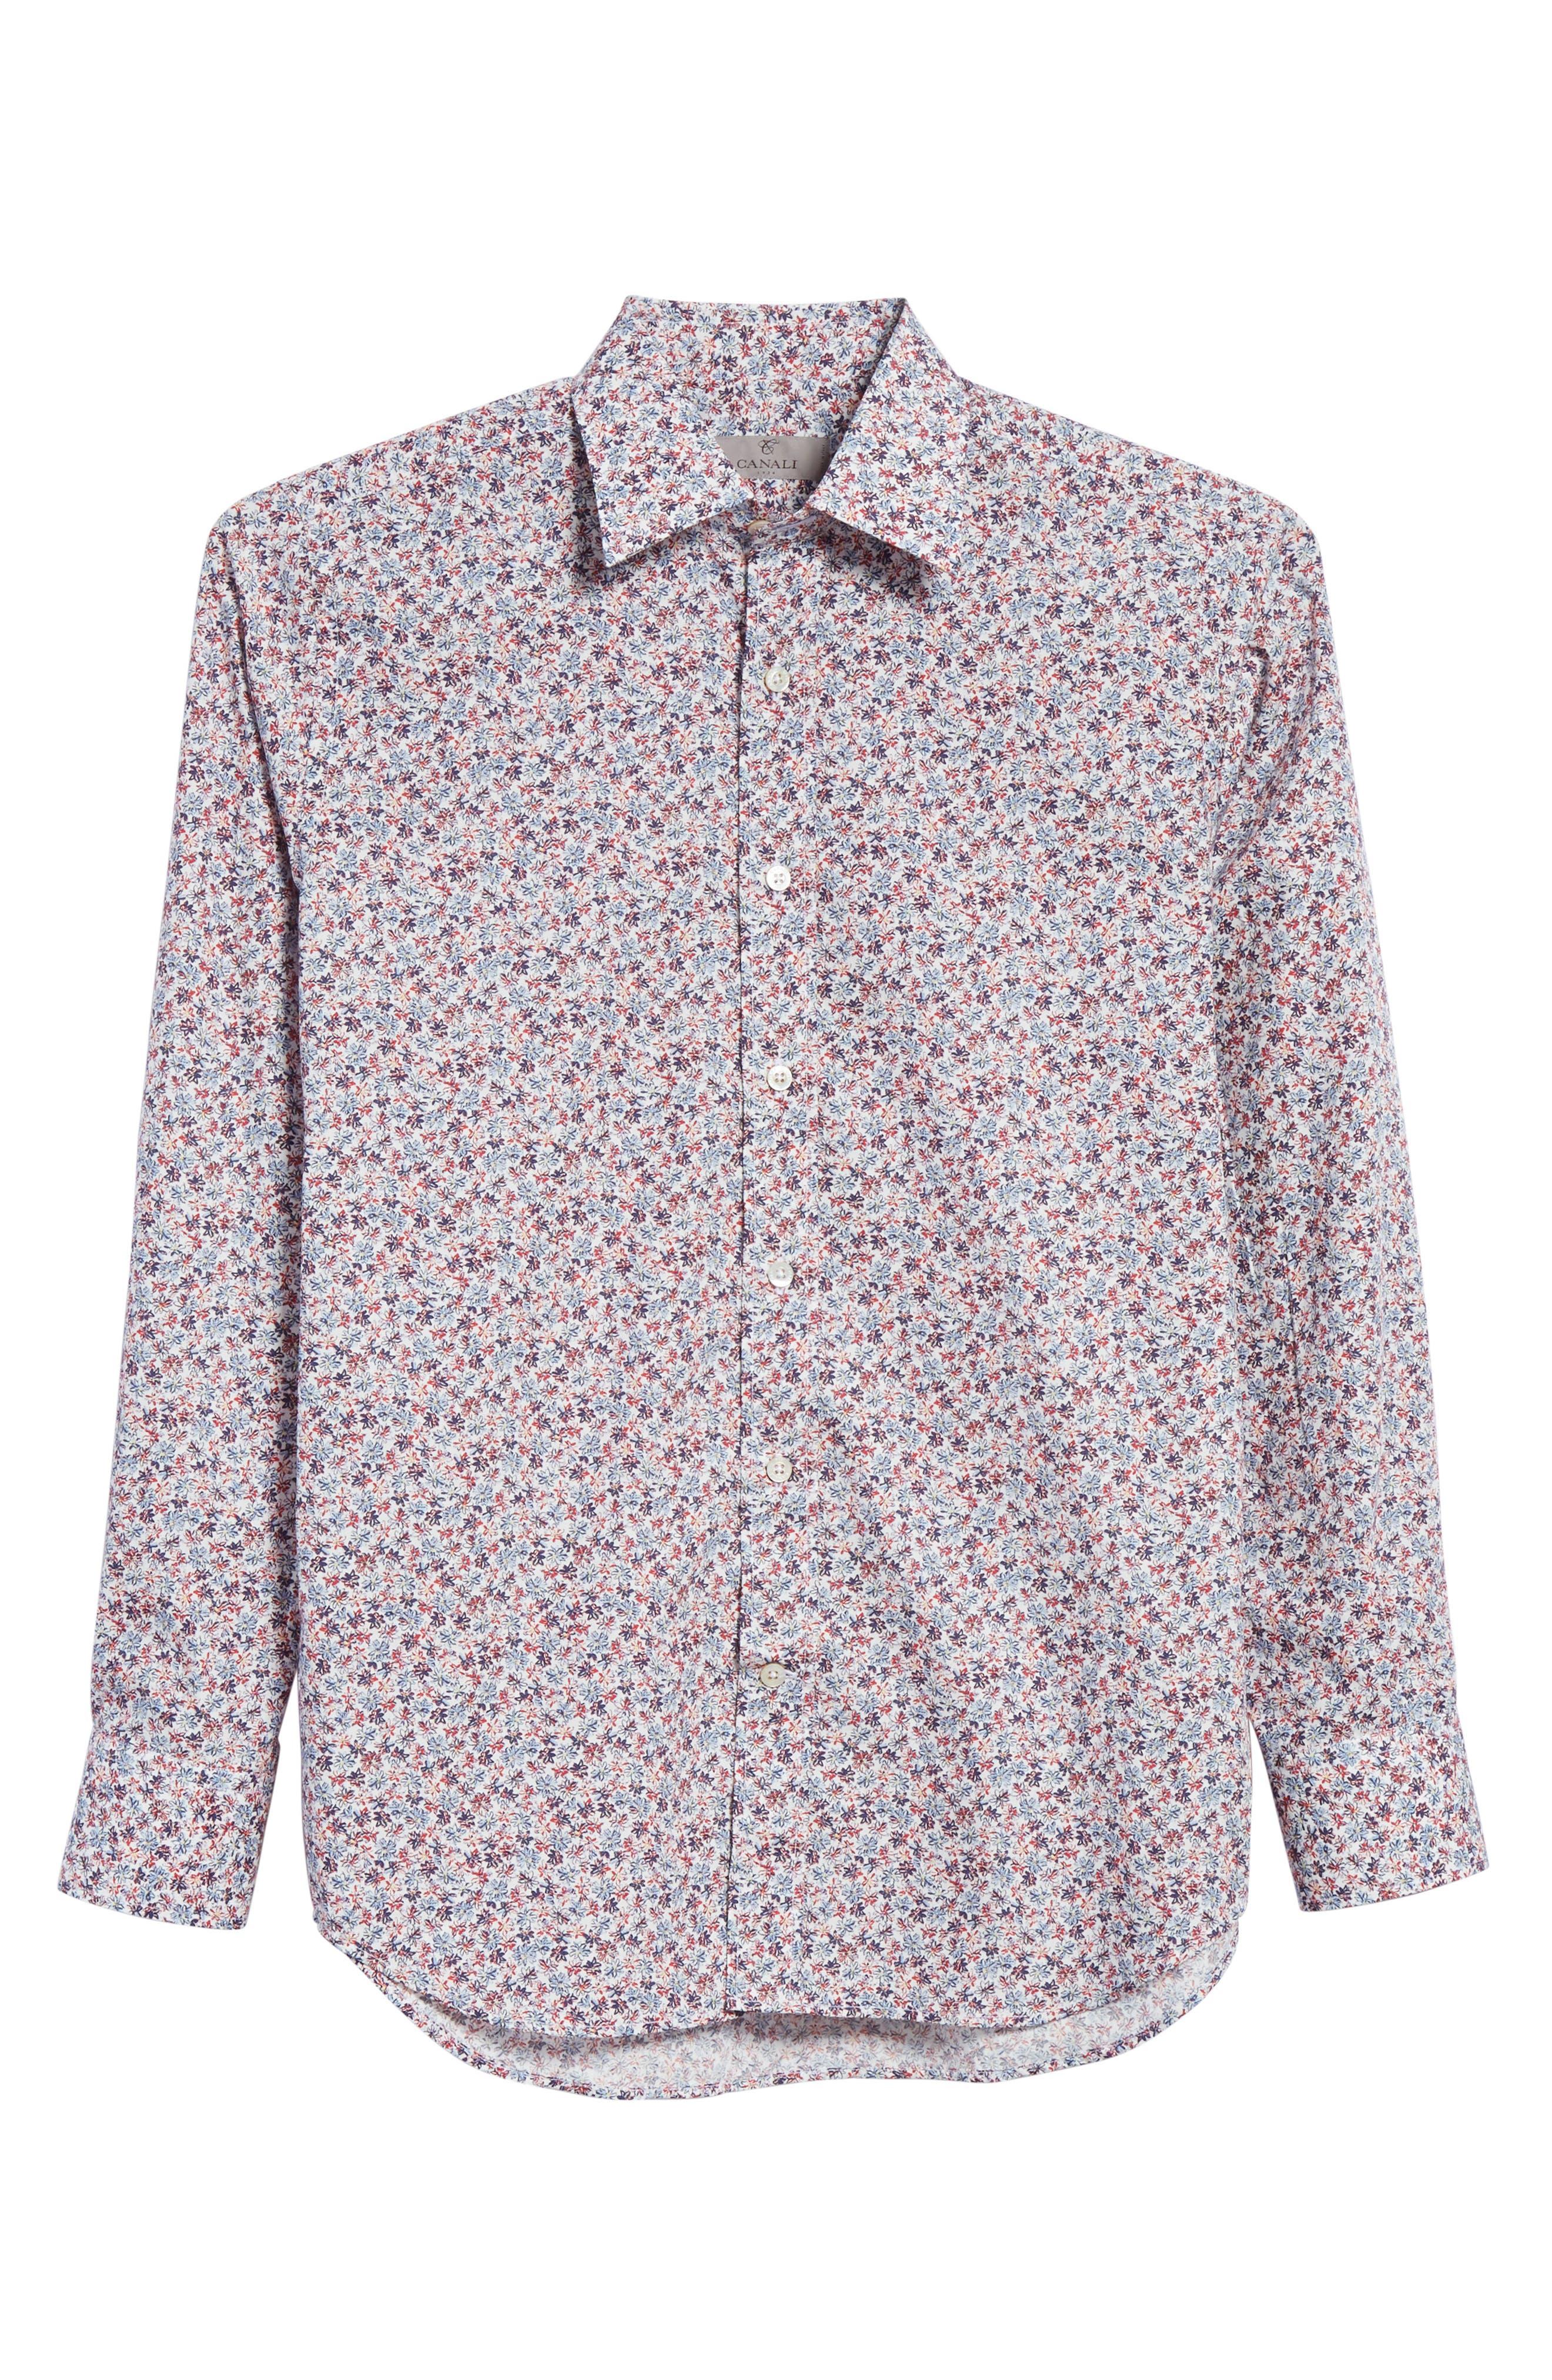 Regular Fit Floral Sport Shirt,                             Alternate thumbnail 6, color,                             100